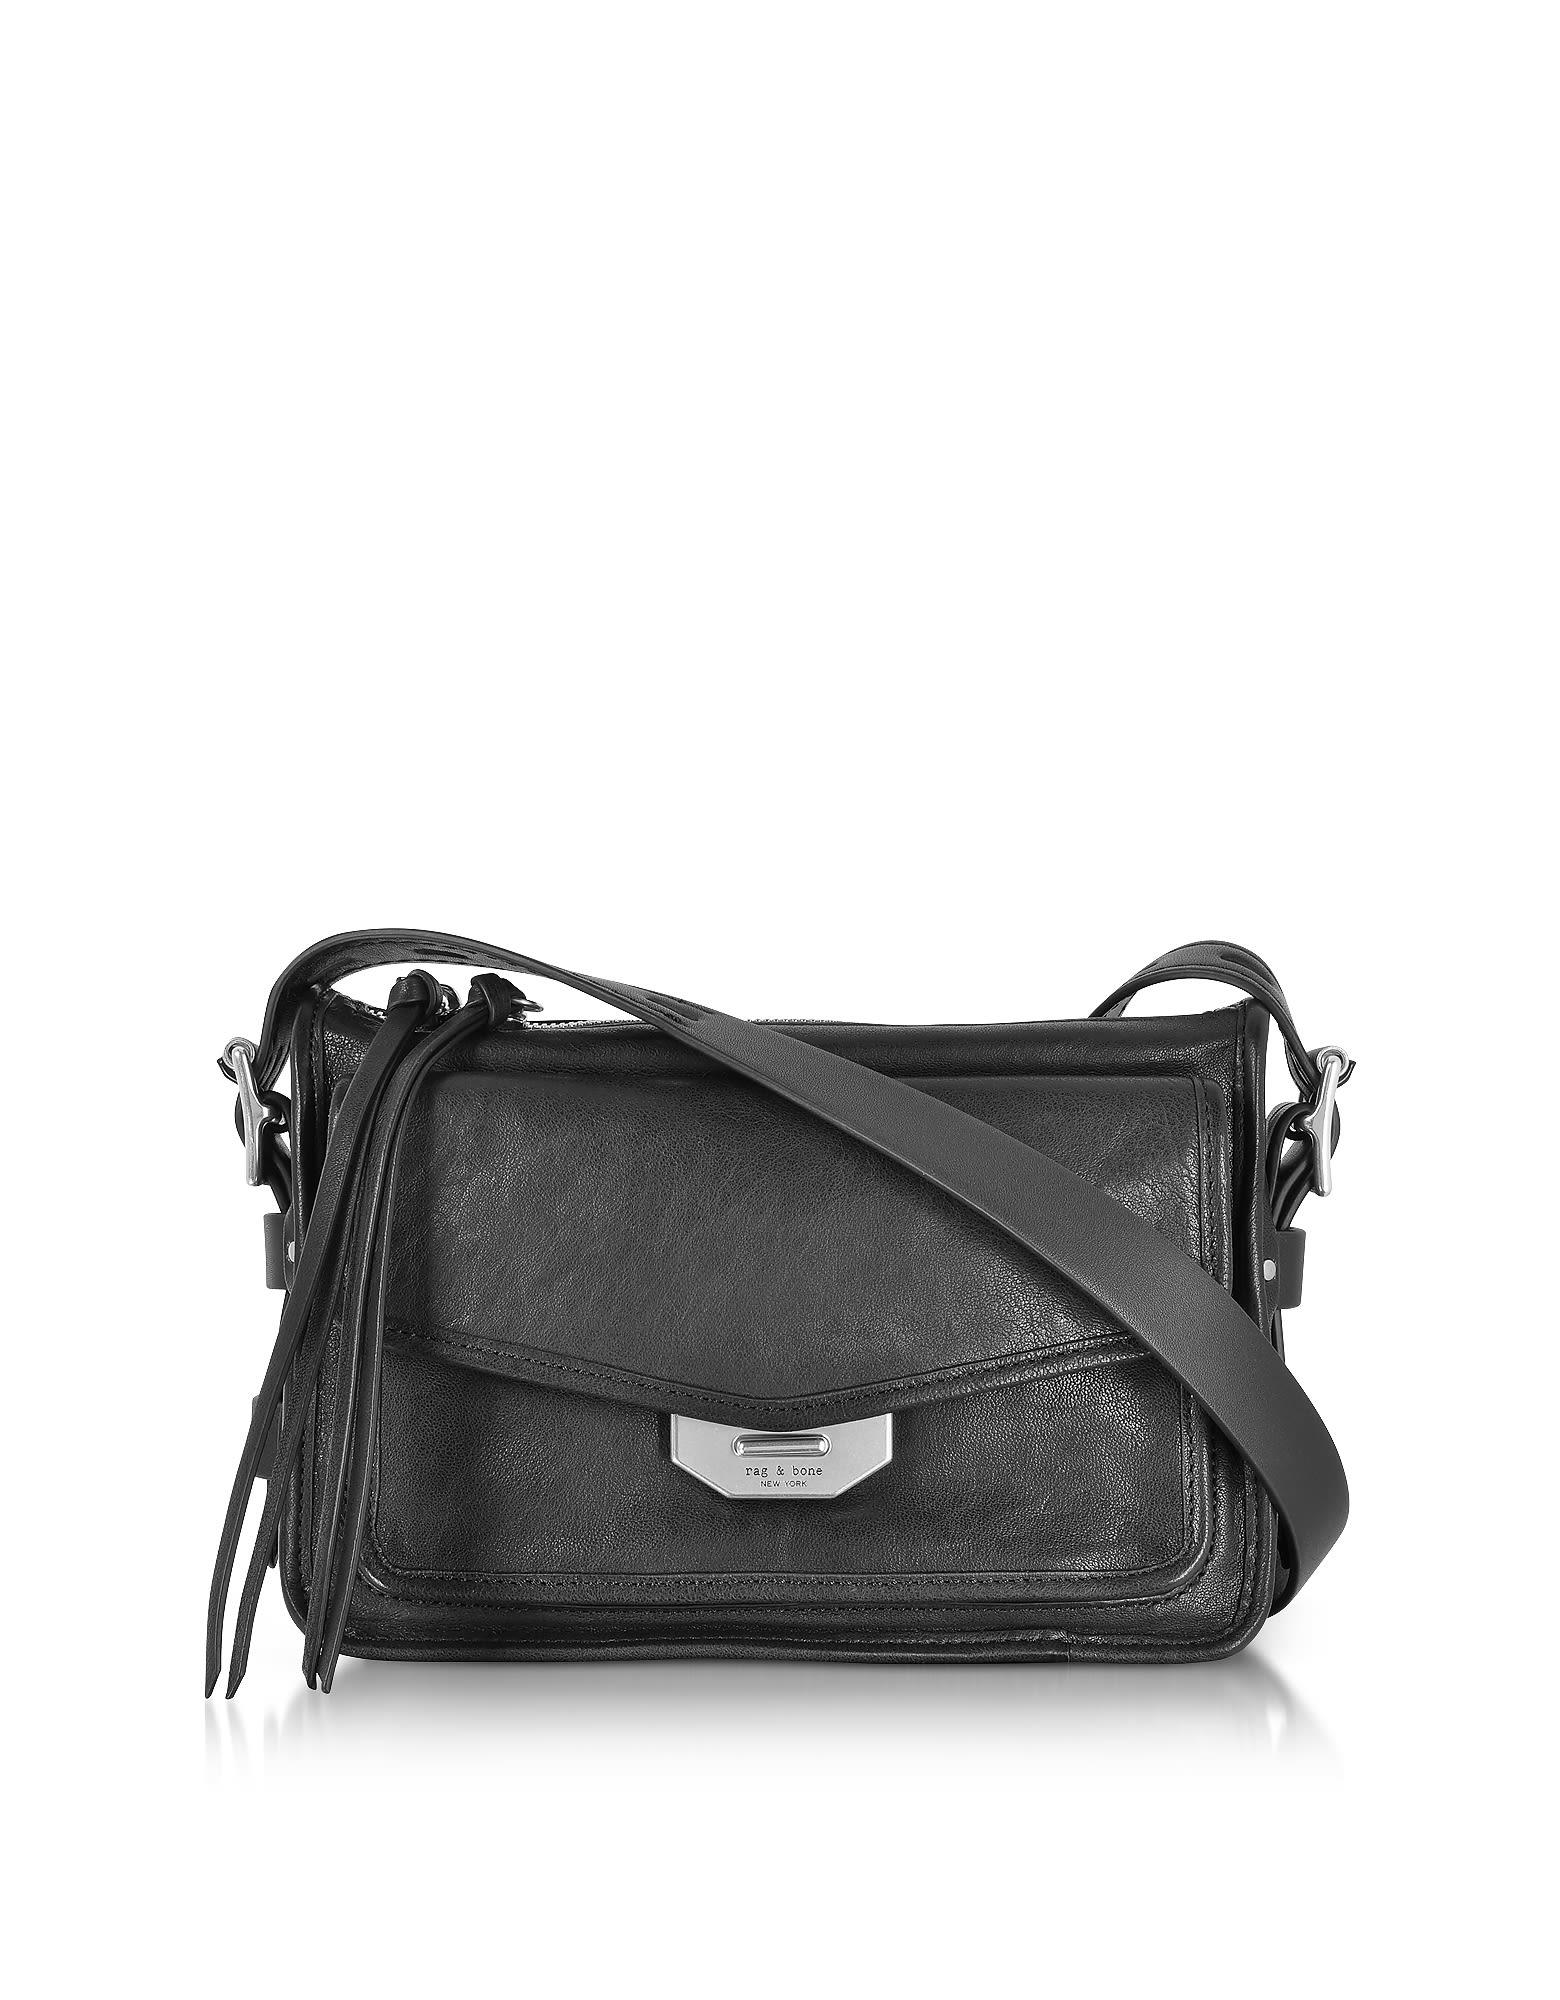 Rag & Bone Black Leather Small Field Messenger Bag